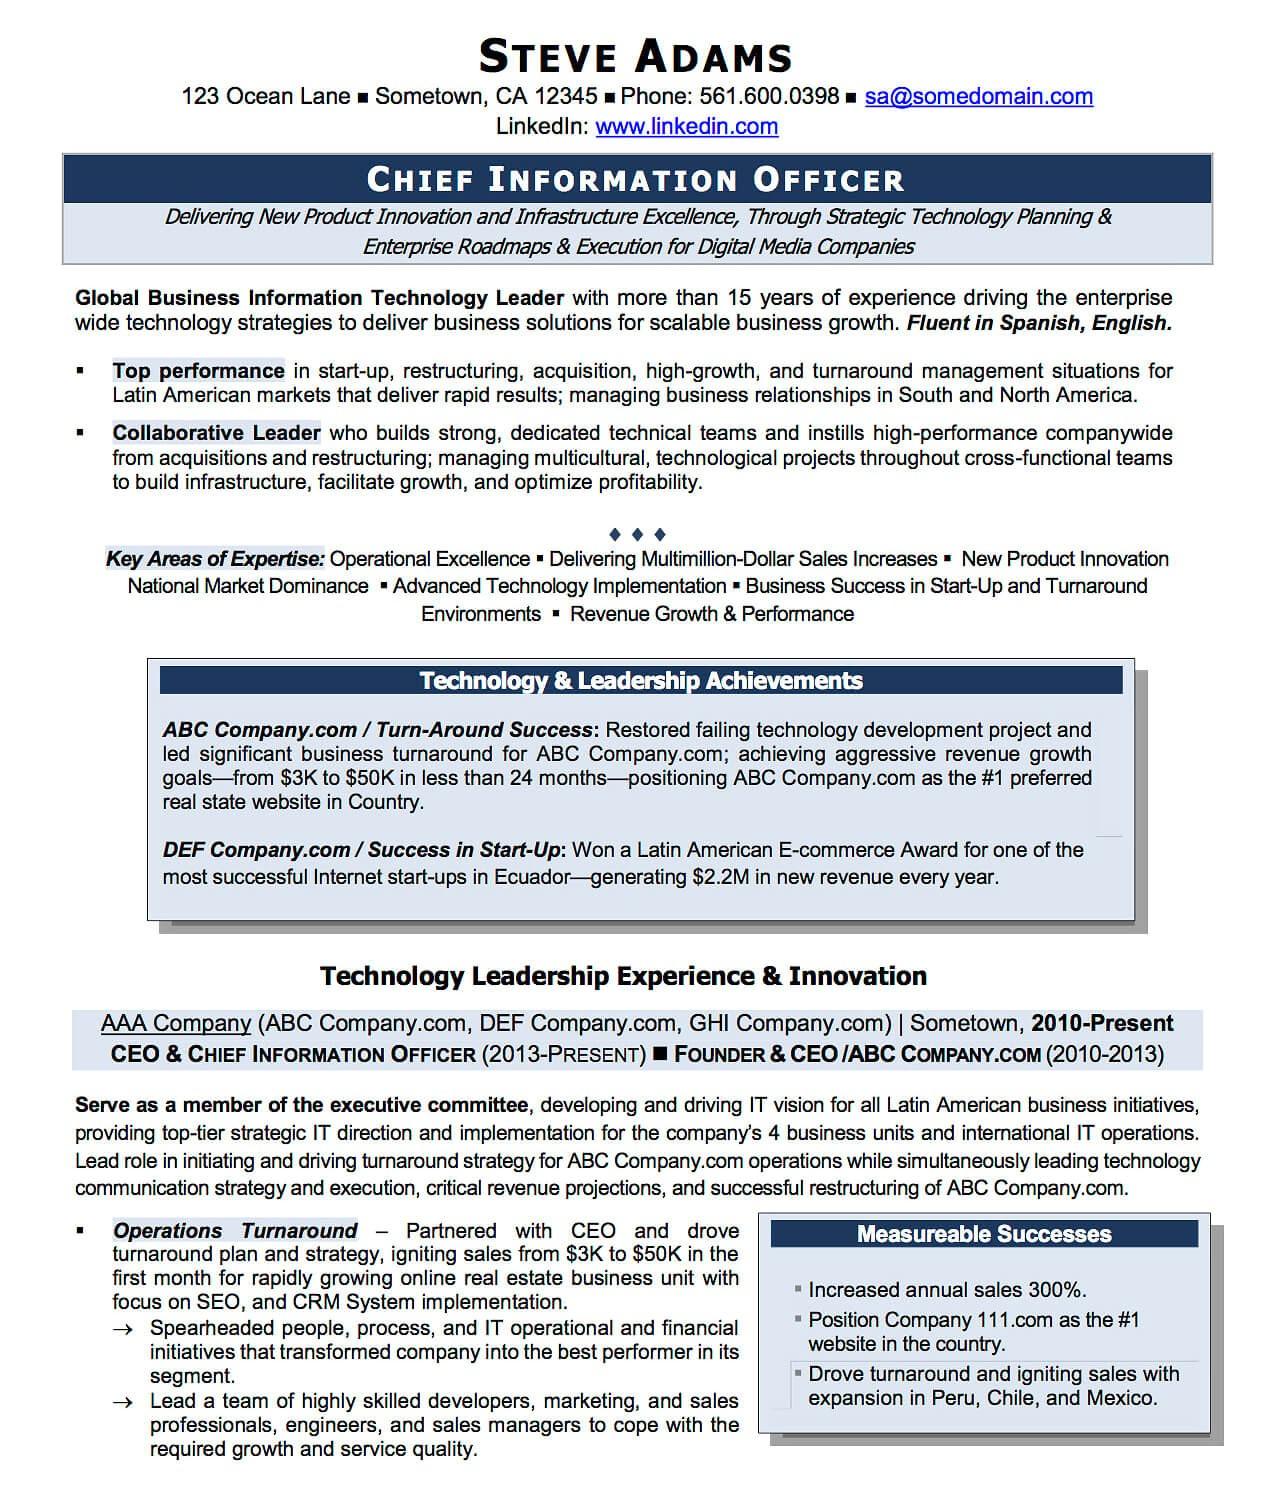 Cio Resume Samples Resume Examples Cv Sample Resume Templates Rso Resumes